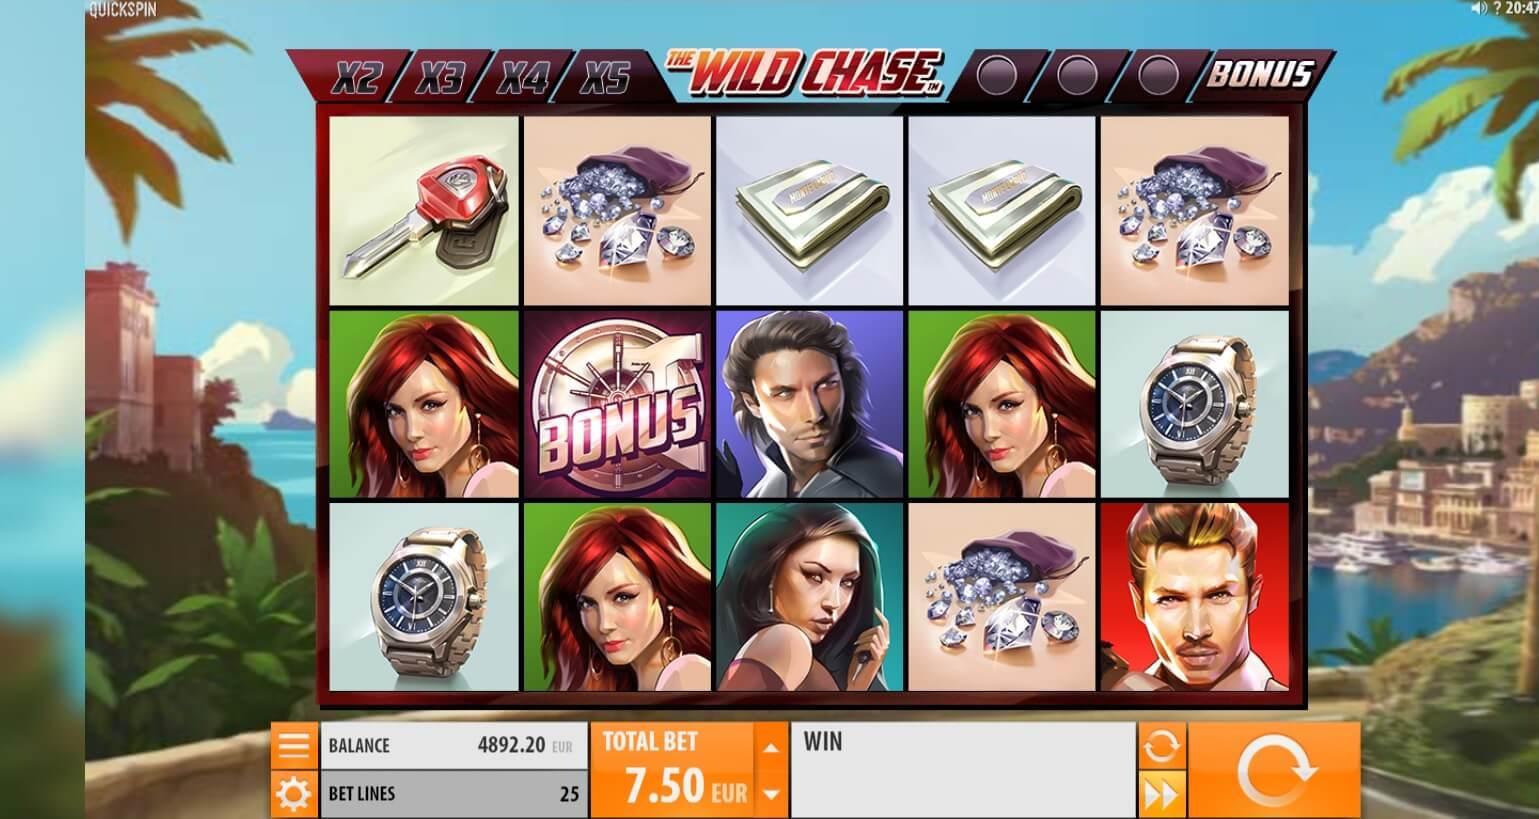 Wild Chase Slot Machine - How to Play